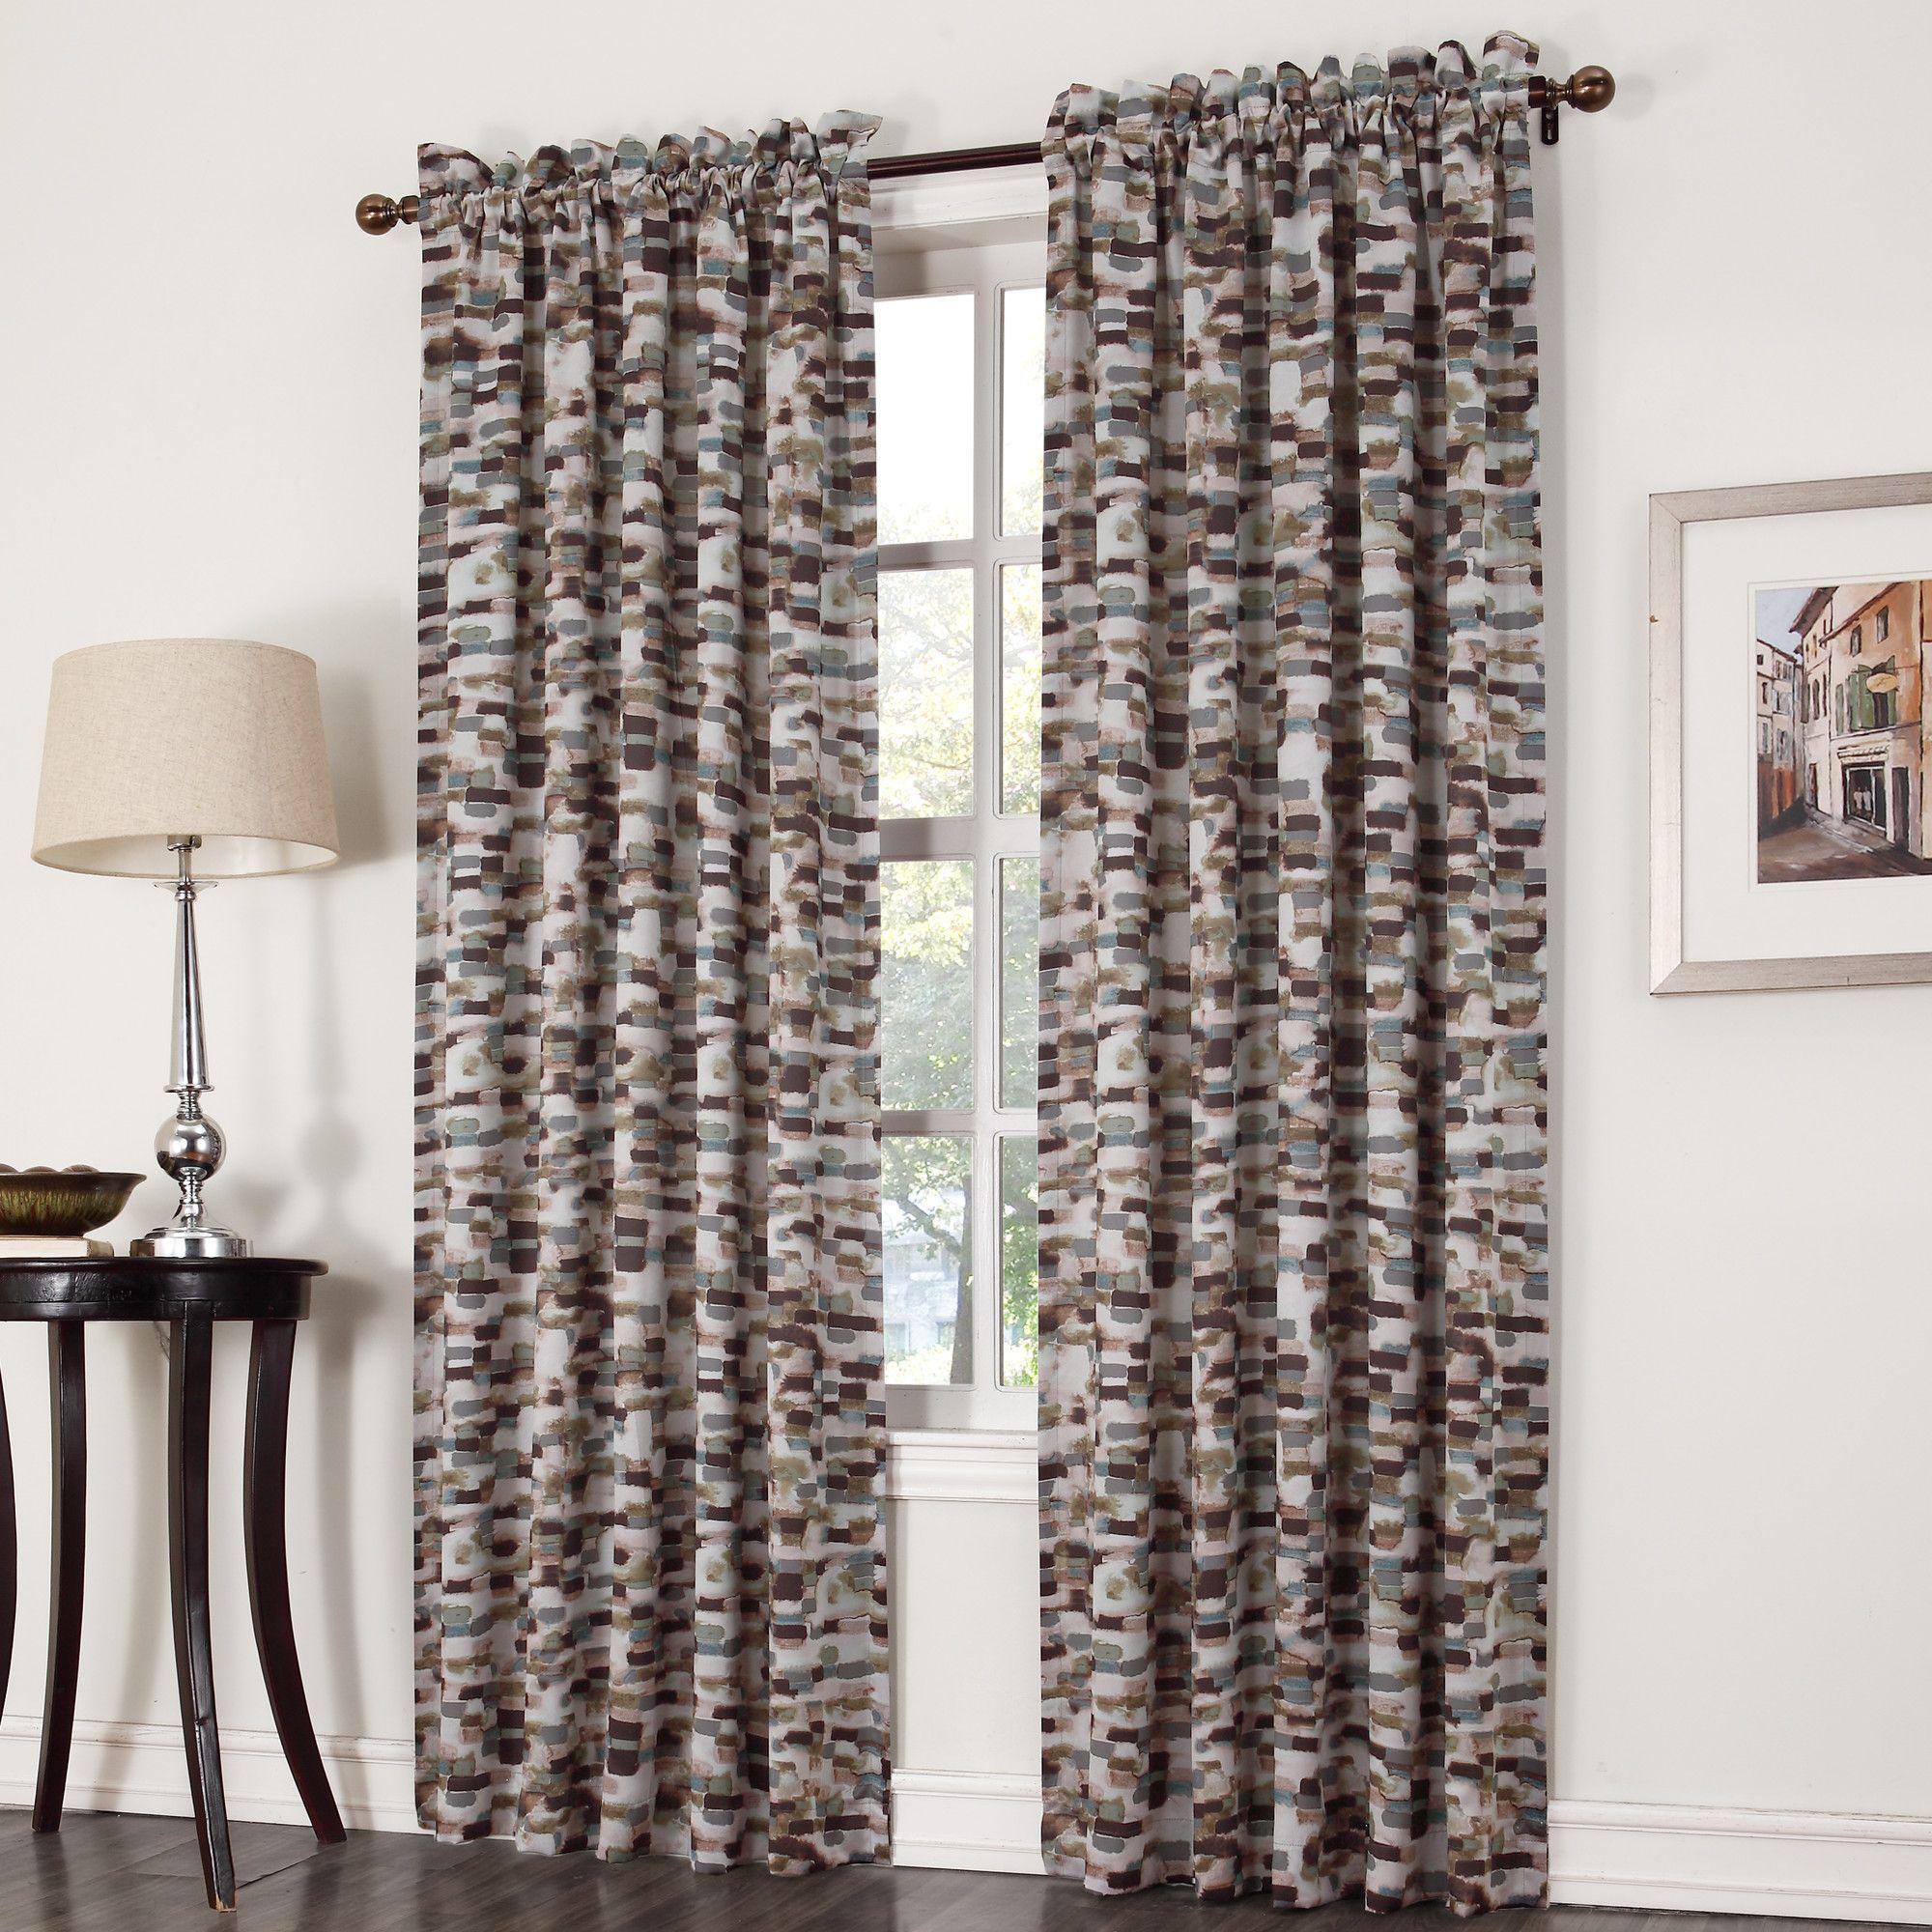 Window coverings to block sun  rex watercolor block print rod pocket single curtain panel